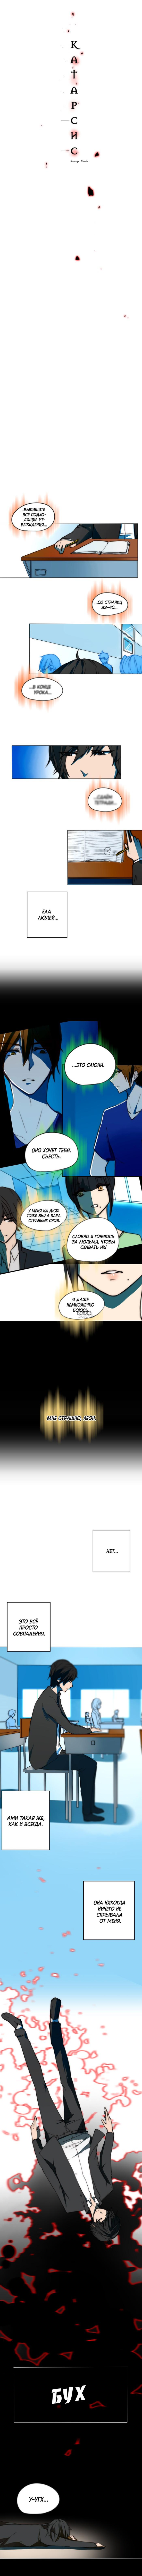 https://r1.ninemanga.com/comics/pic2/3/21955/269237/1437601831352.jpg Page 1